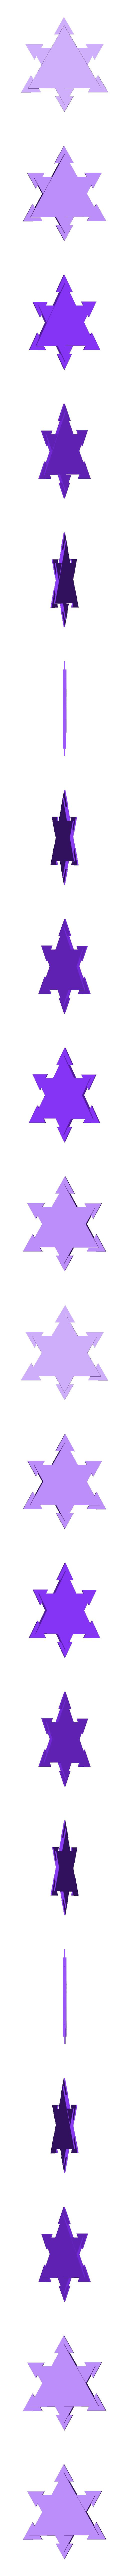 Triangle-Dent flexipickII 1'15 Starcenter 06 -oo-.stl Download free STL file Triangle-Dent Circle'Piramidal - Electric Guitar Stick & Bass • 3D printer template, carleslluisar